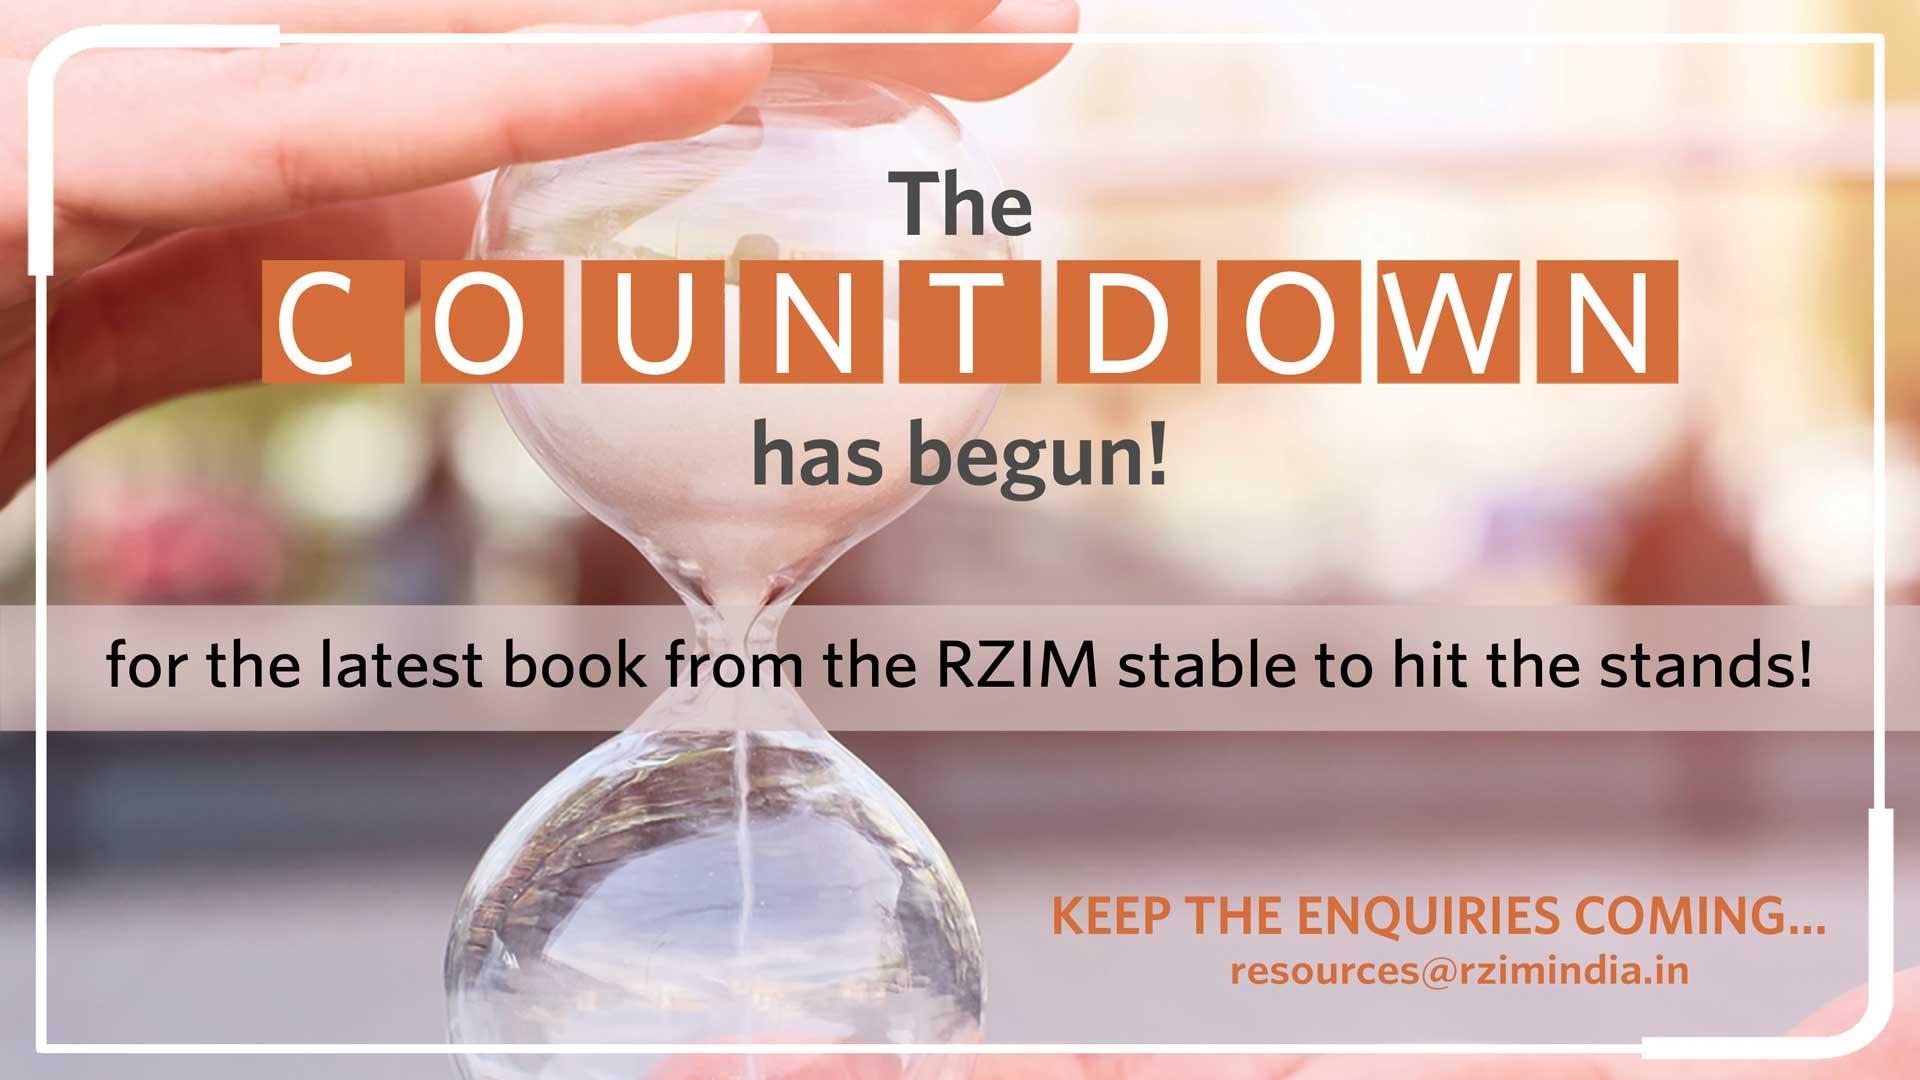 The Count Down has begun - Book Promo